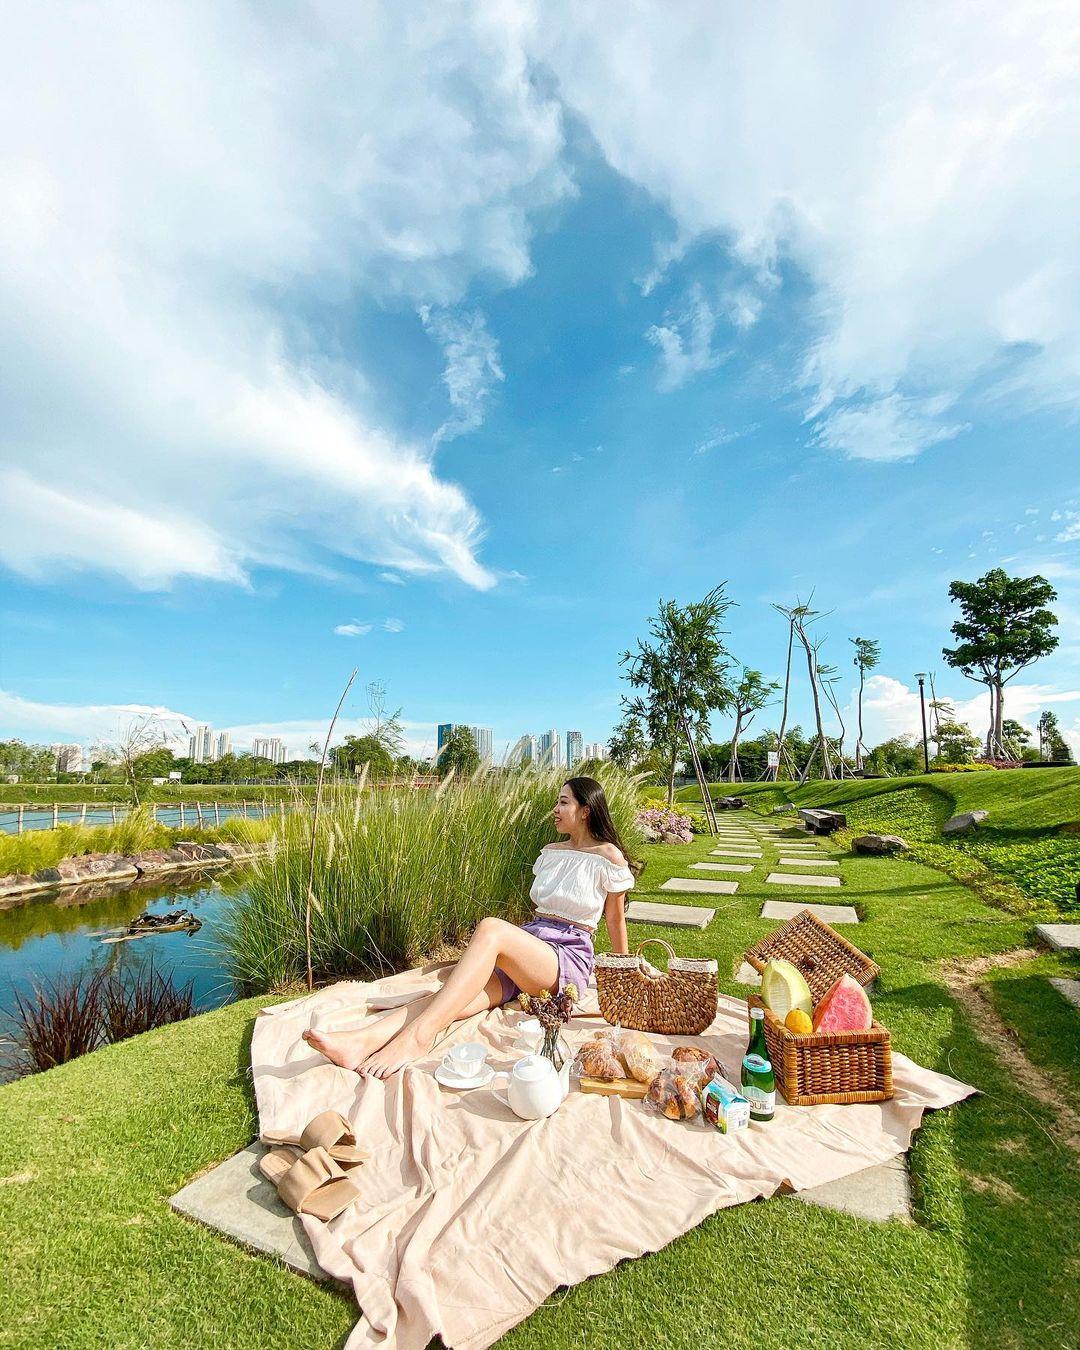 Piknik Di Graha Natura Park Image From @fannyhalimm